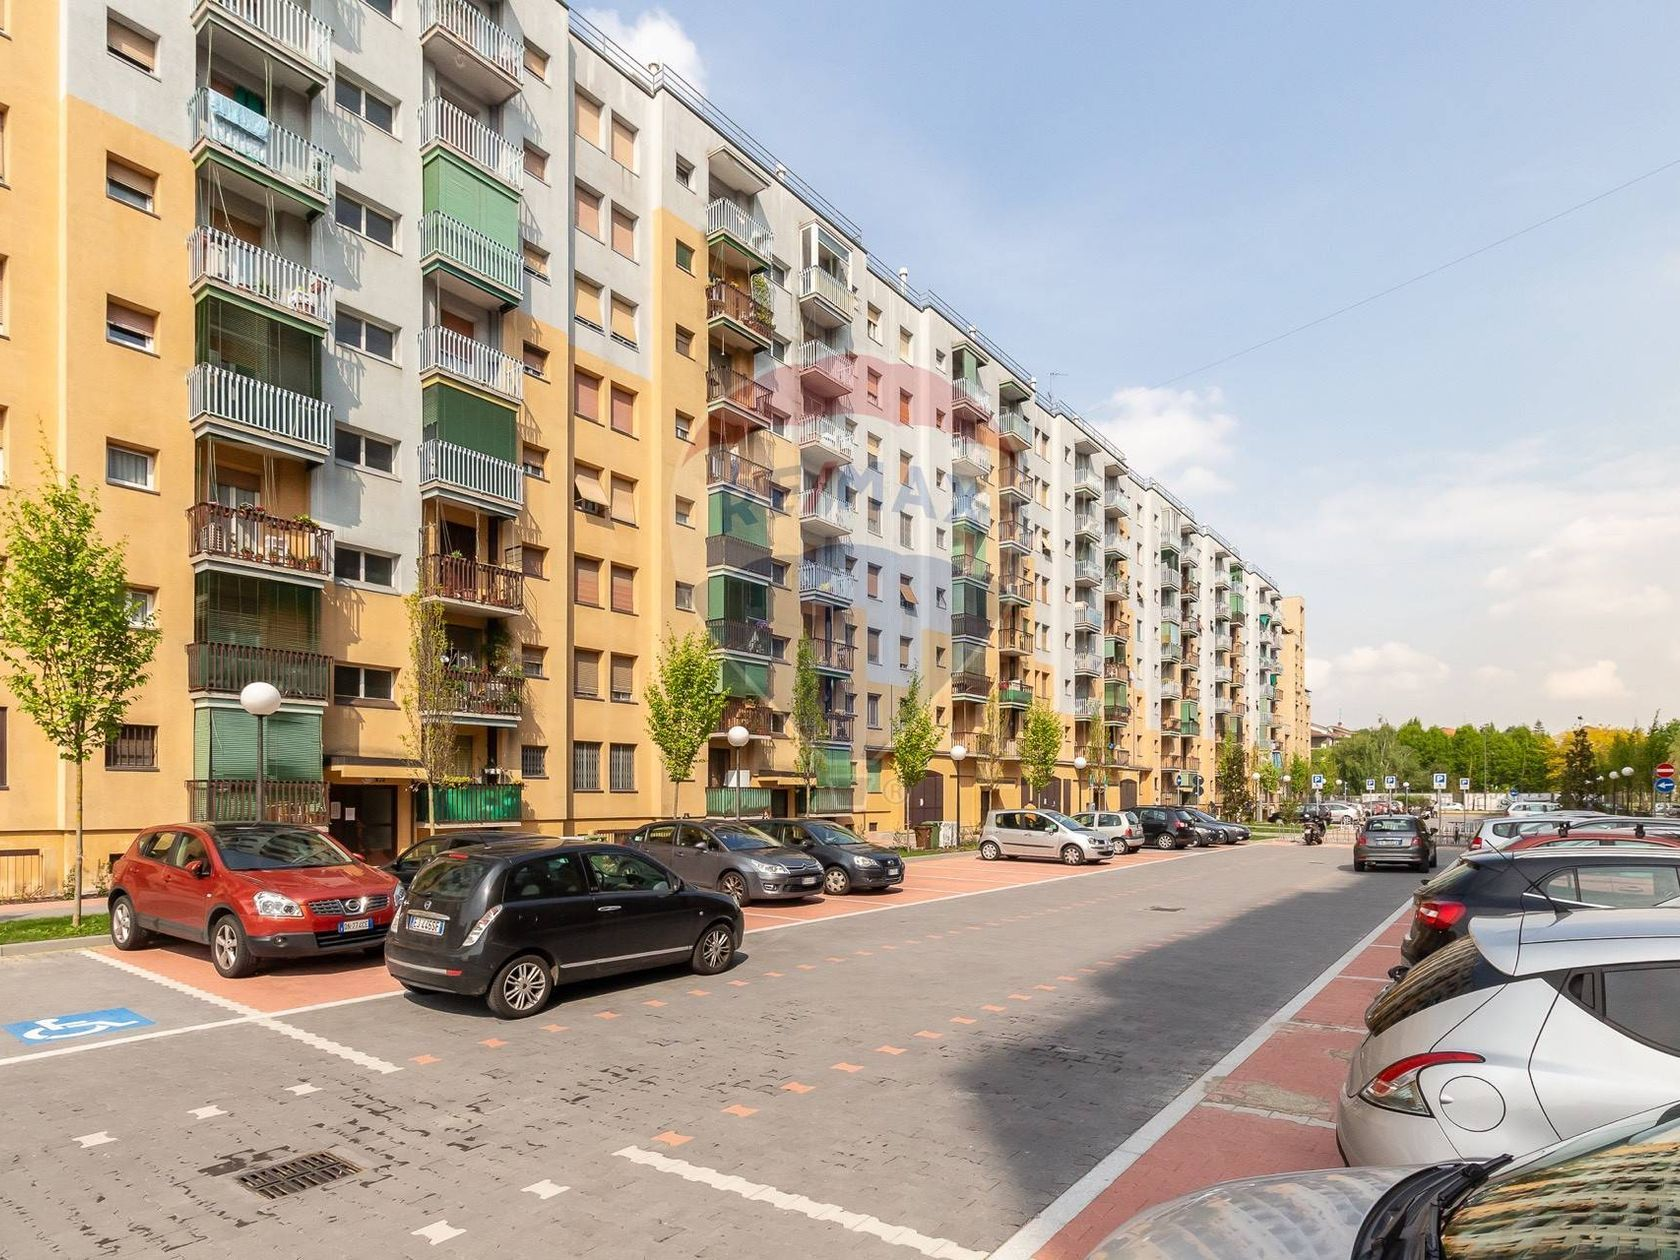 Appartamento Milano-certosa Quarto Oggiaro Villapizzone, Milano, MI Vendita - Foto 21